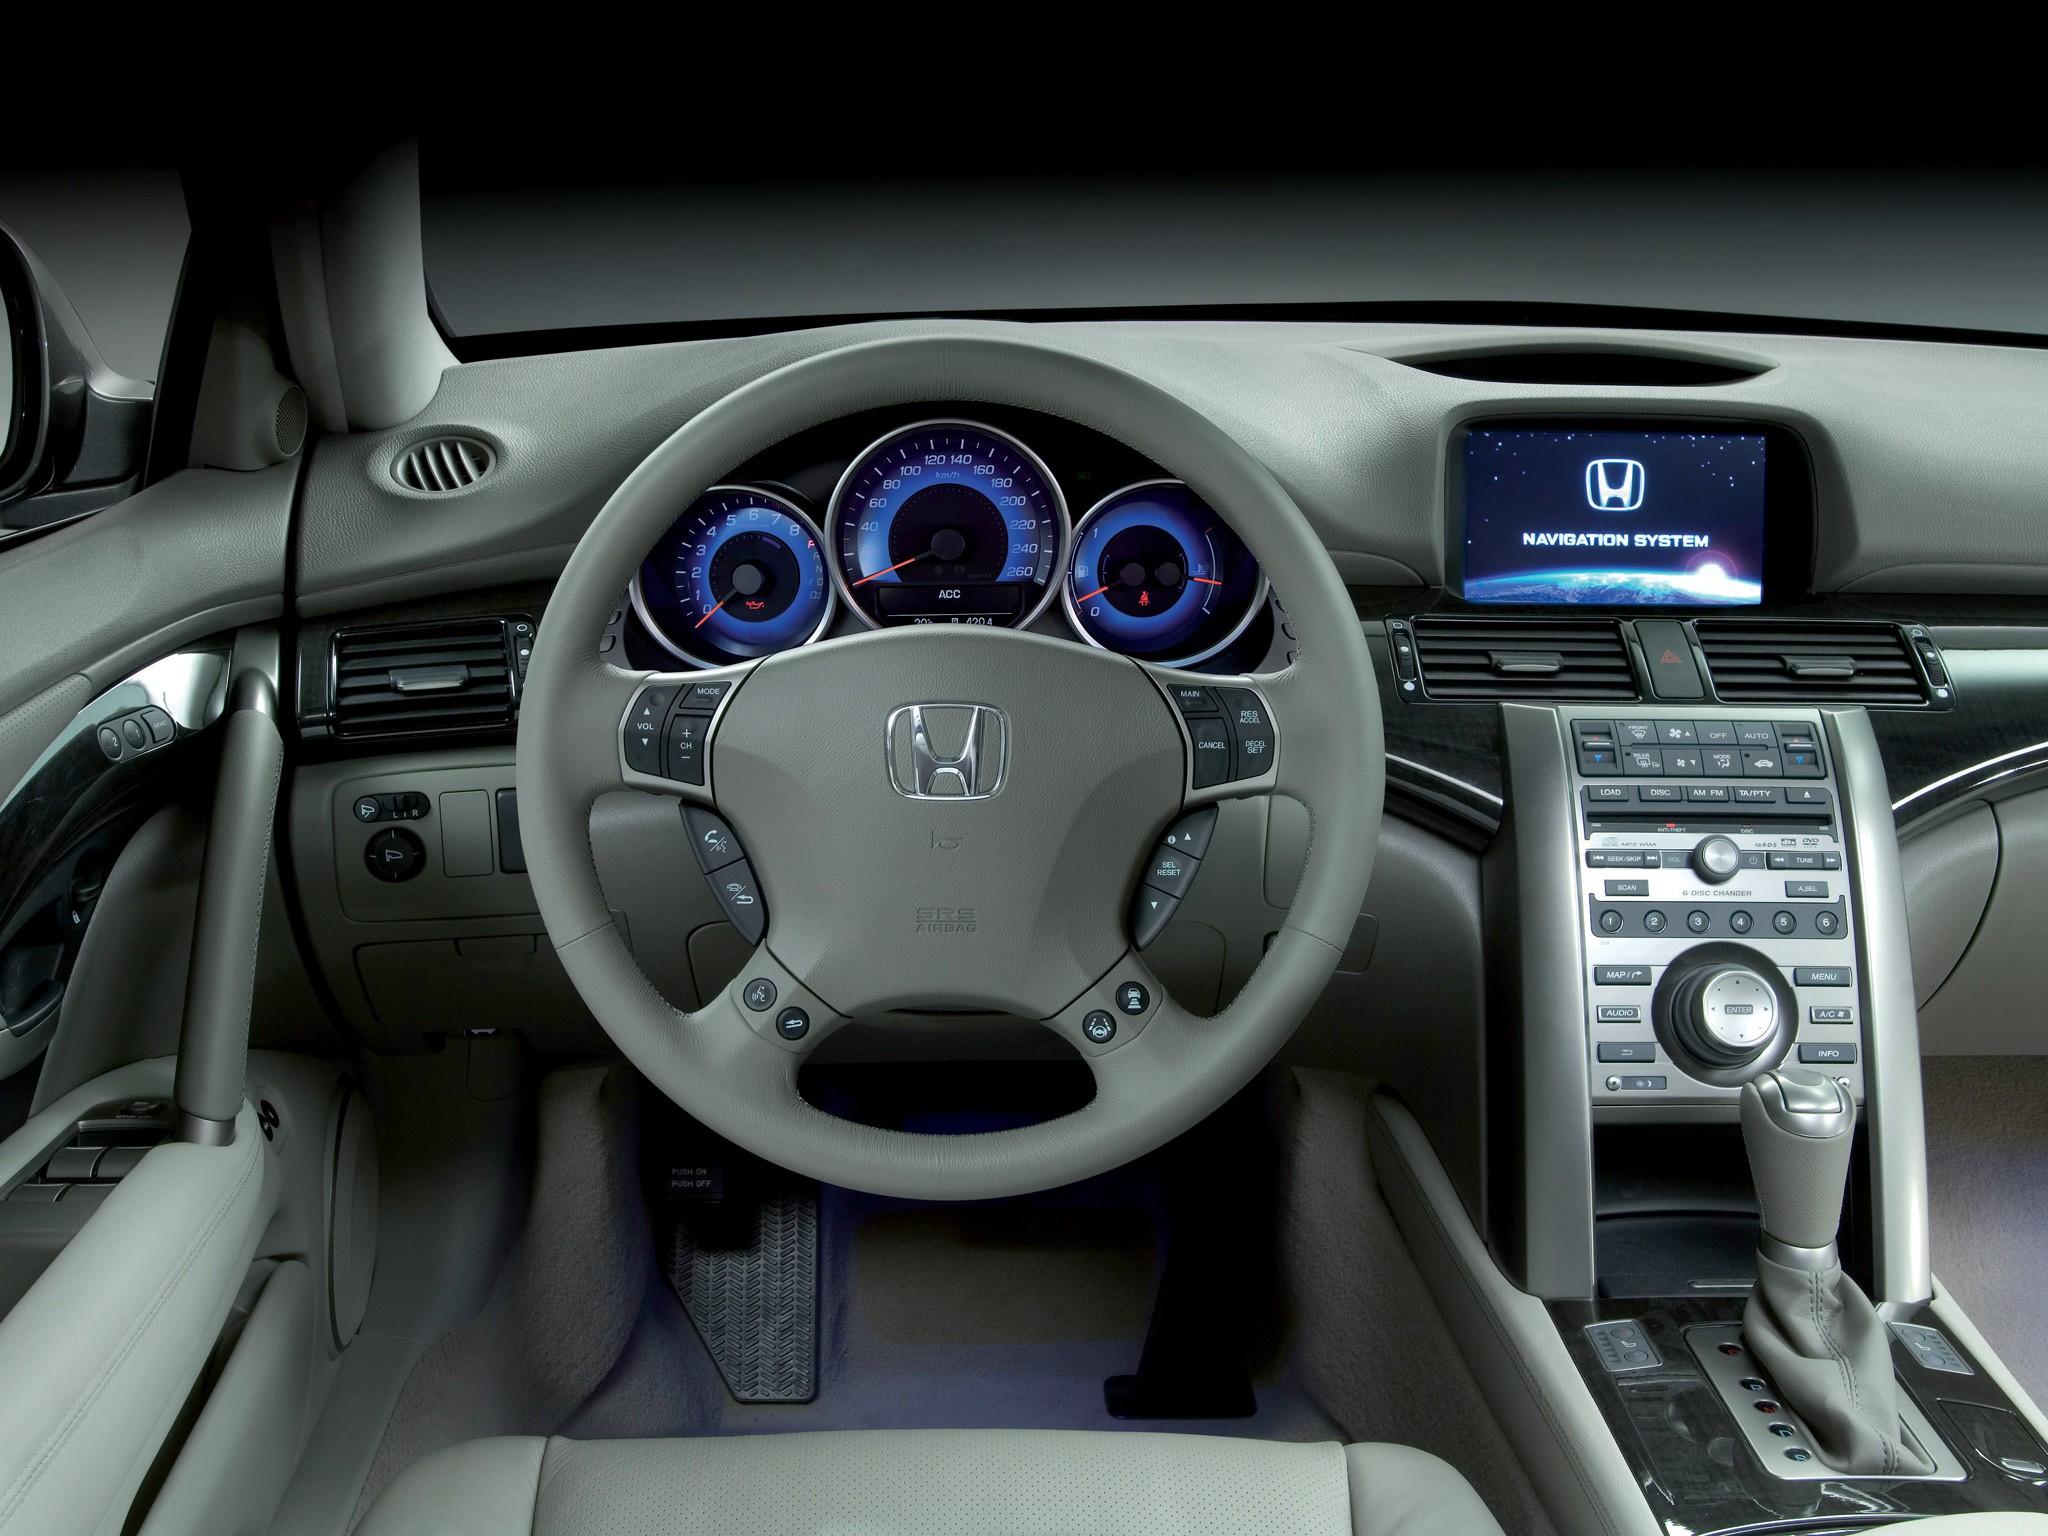 HONDA Legend Specs 2009 2010 2011 2012 Autoevolution